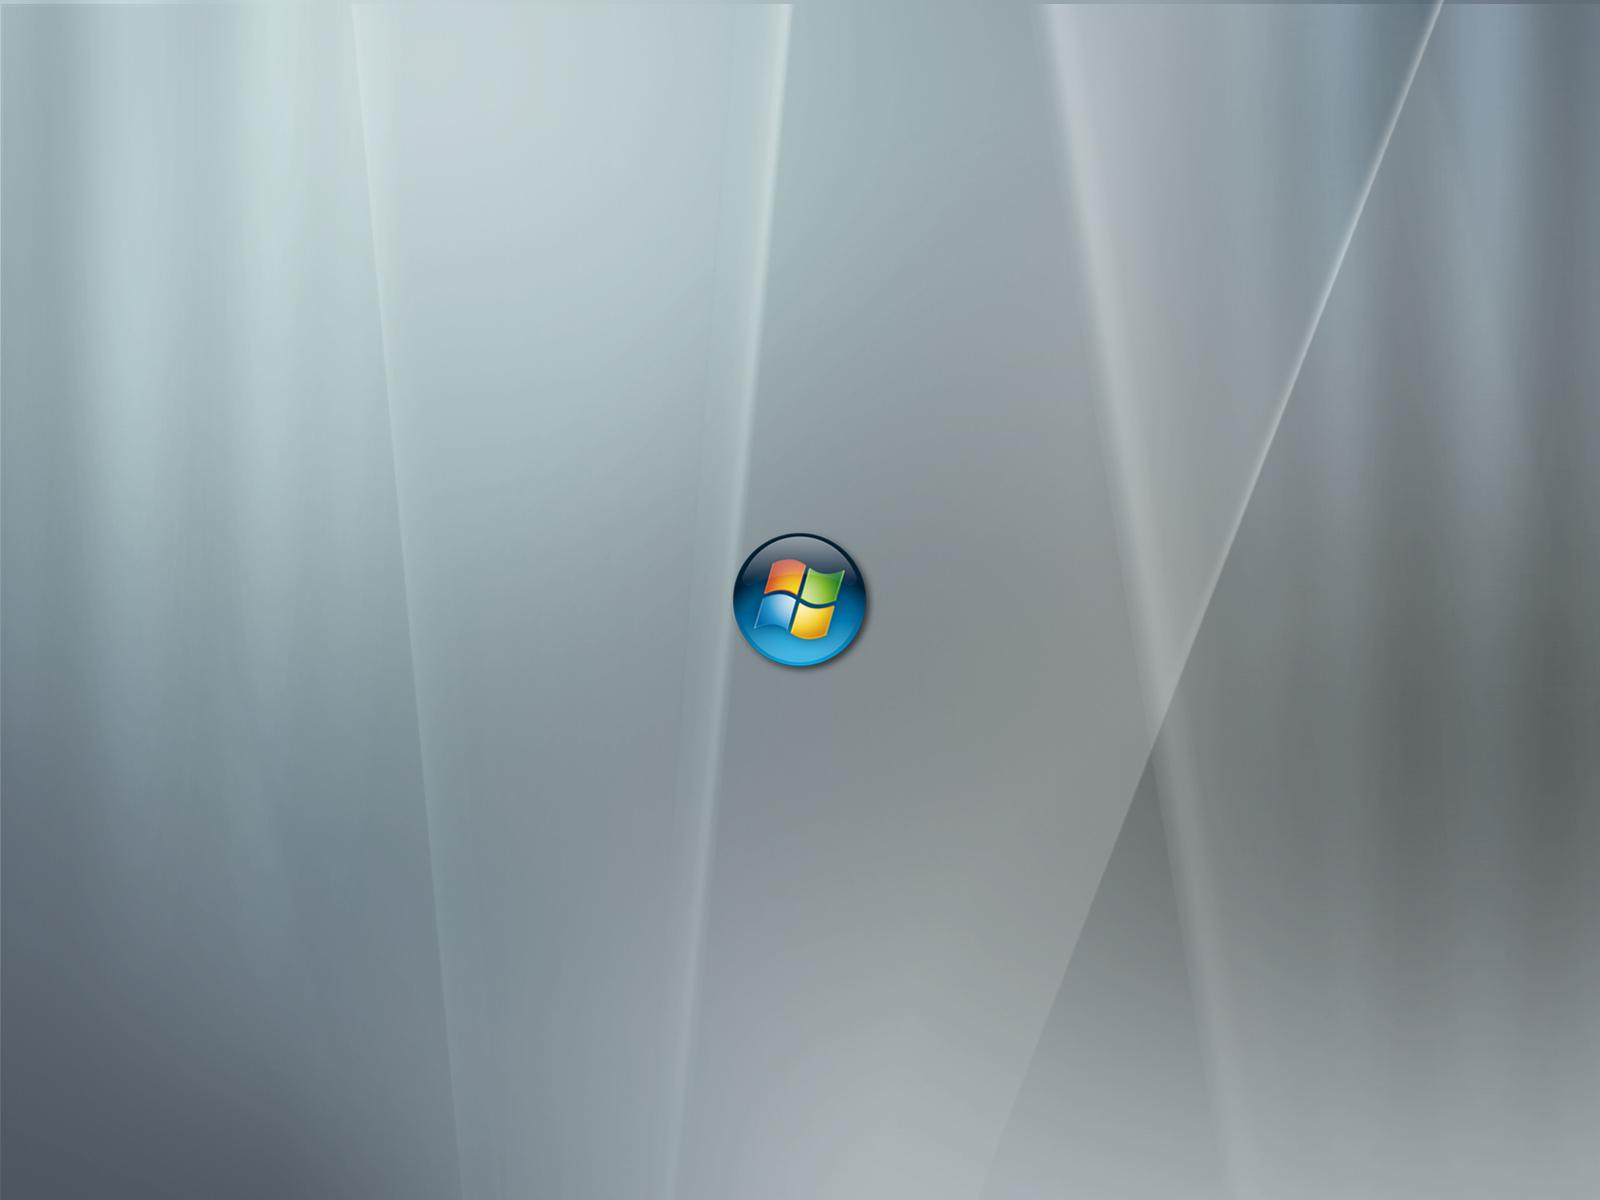 http://4.bp.blogspot.com/-vIOXG-eQoyc/Truzvey7fyI/AAAAAAAARB8/wodVQe9VFC0/s1600/Mooie-windows-achtergronden-leuke-hd-windows-wallpapers-afbeelding-plaatje-26.jpg